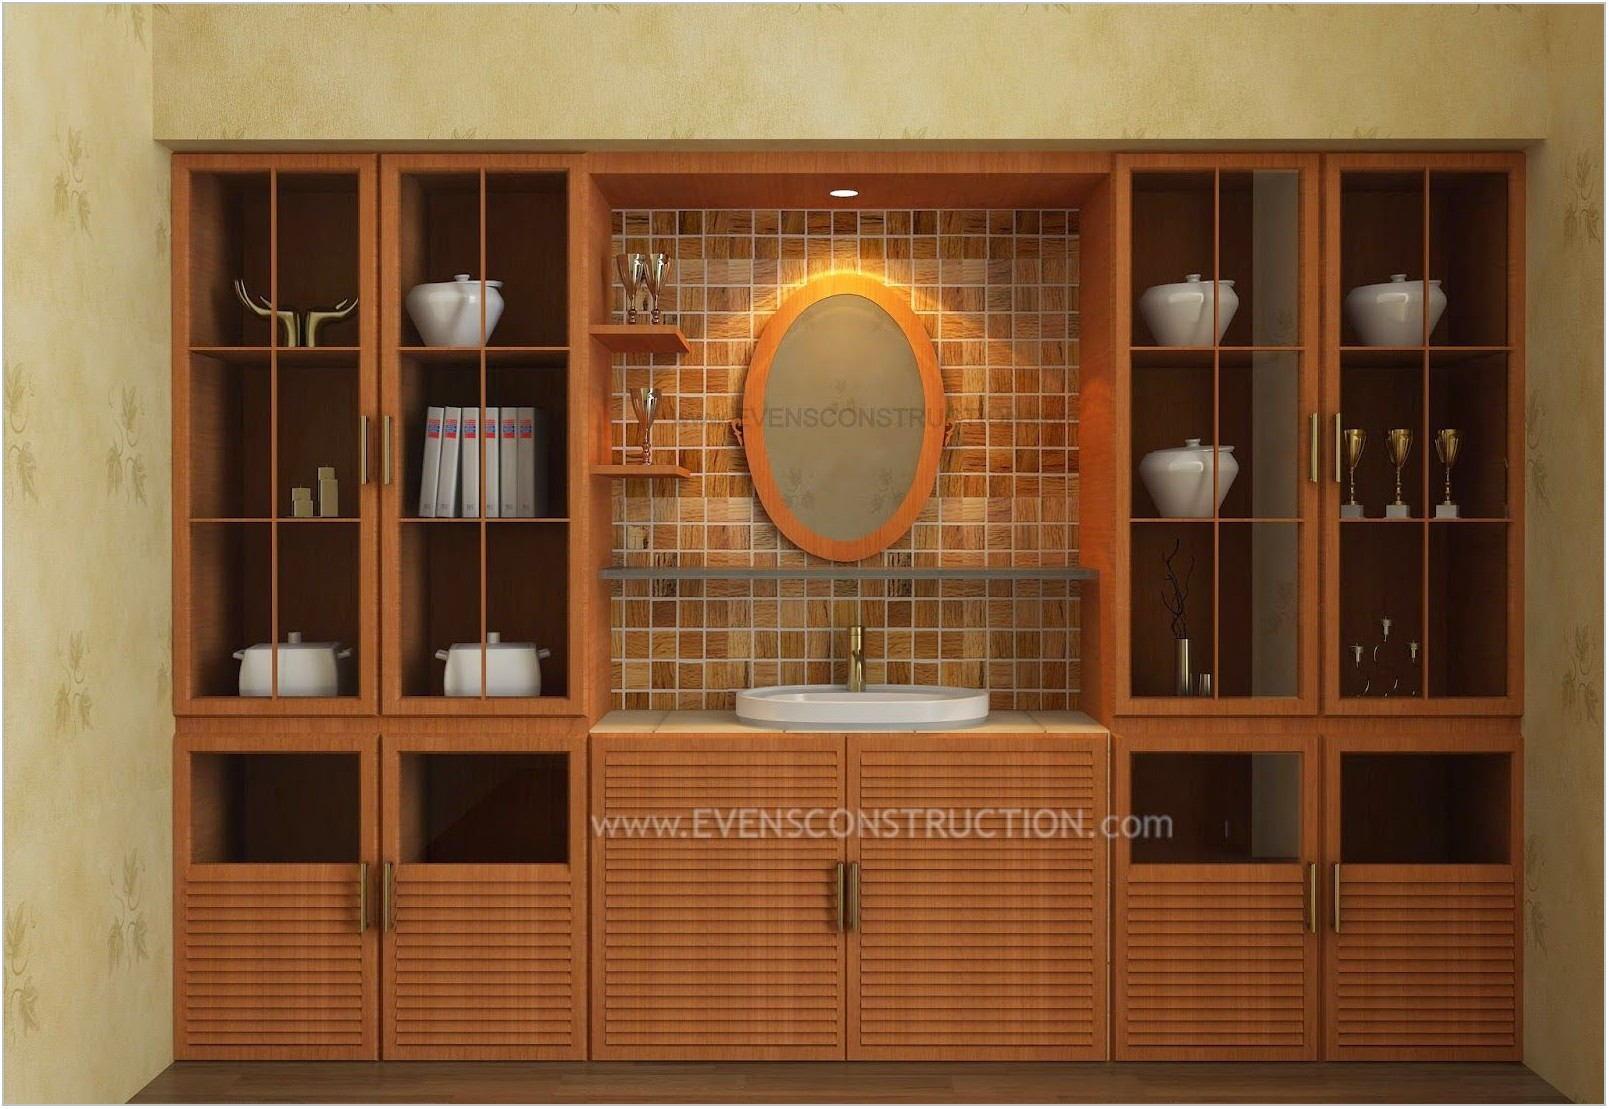 Crockery Cabinet In Dining Room